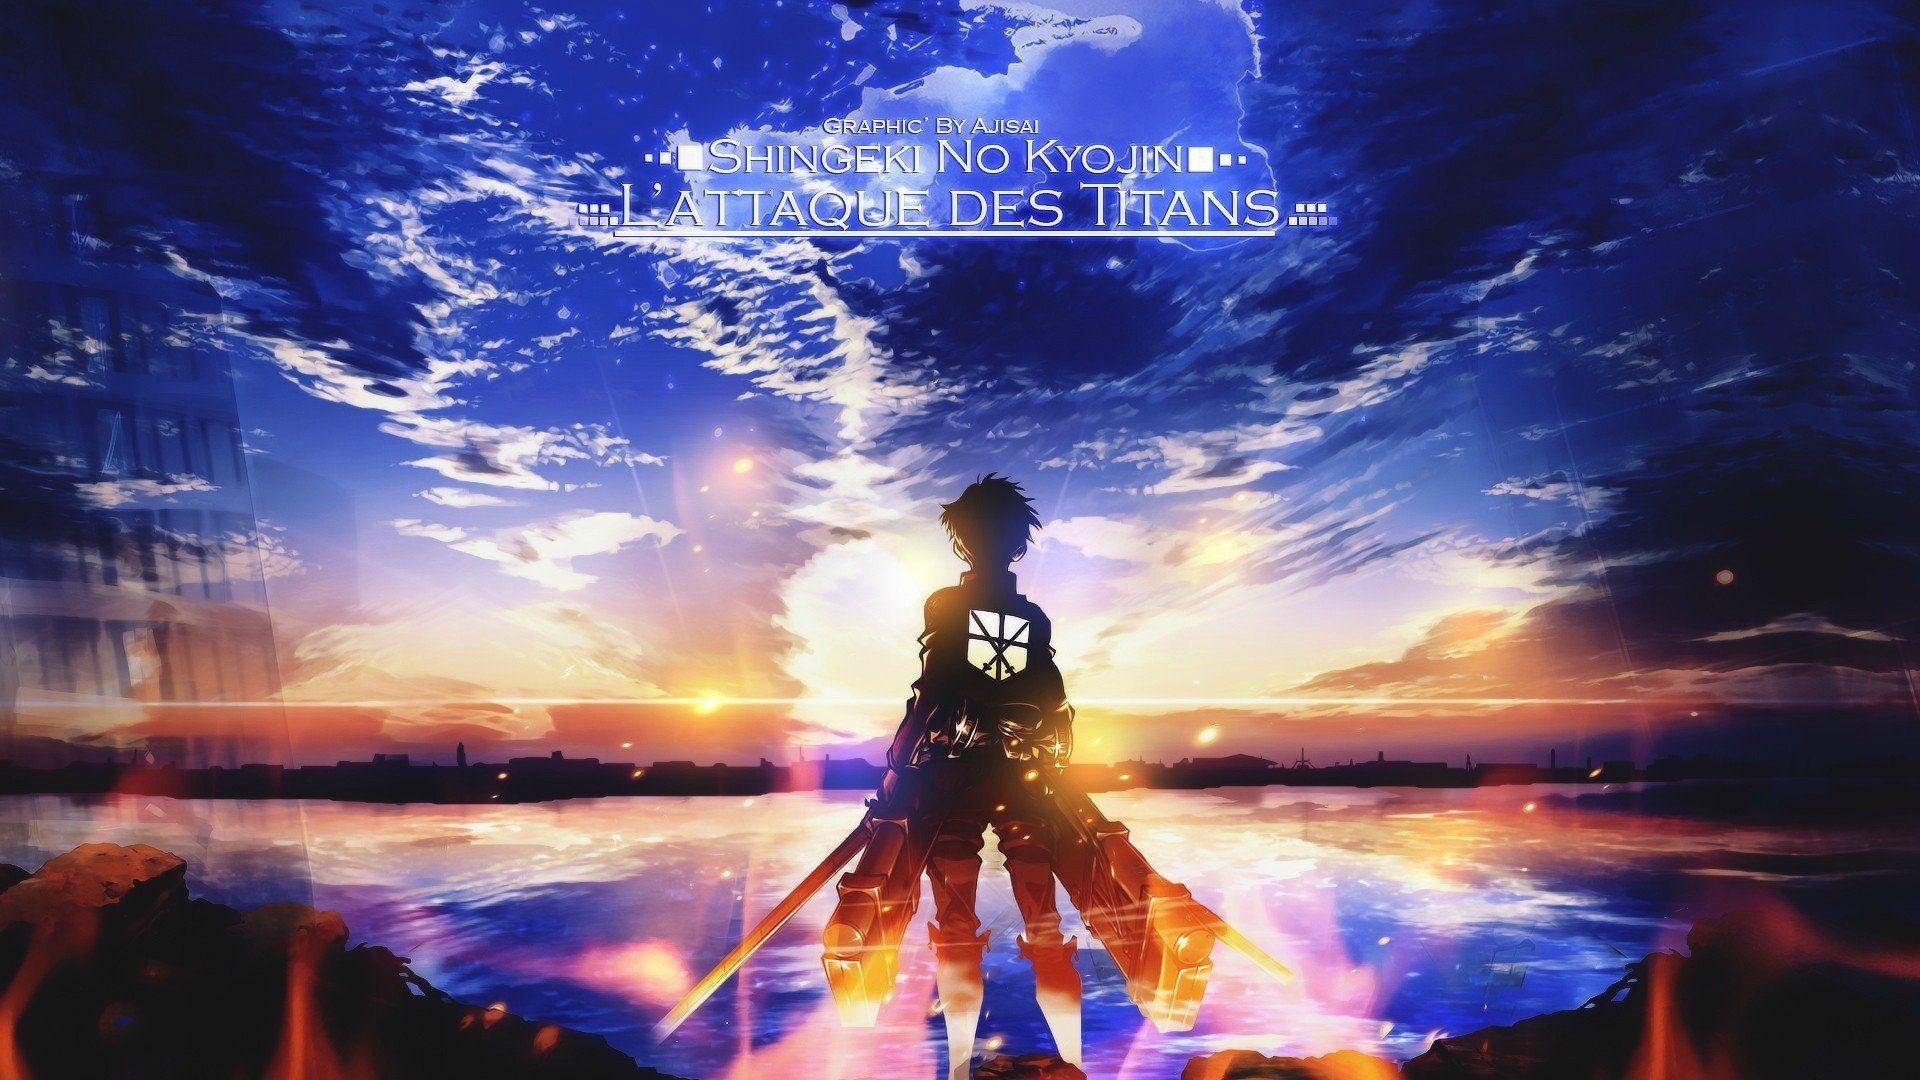 Pin On Attack On Titan